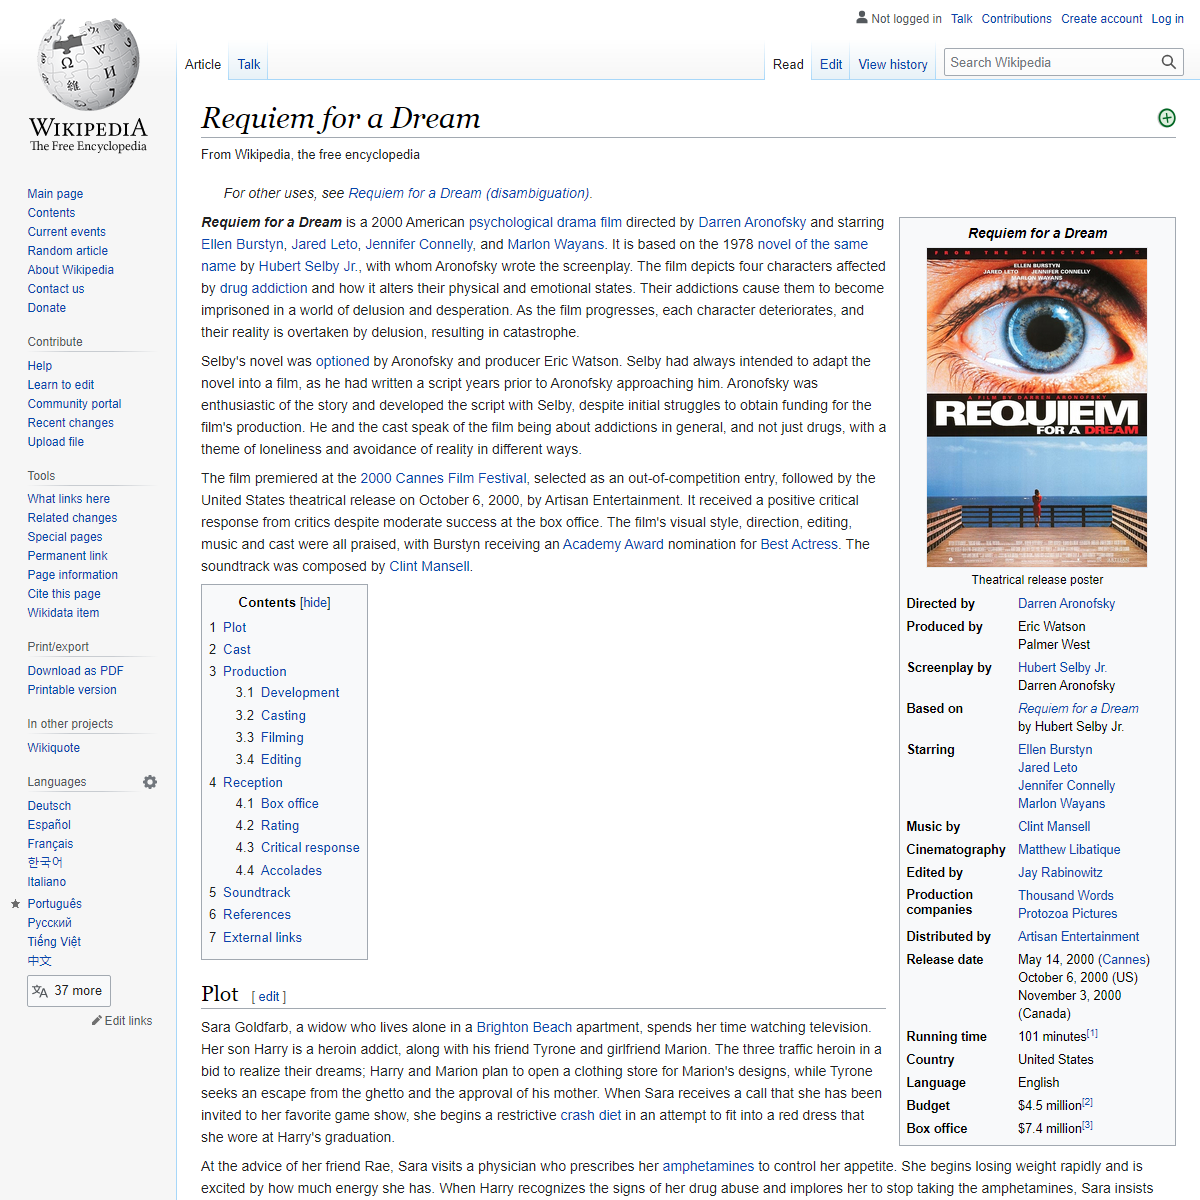 Requiem for a Dream - Wikipedia